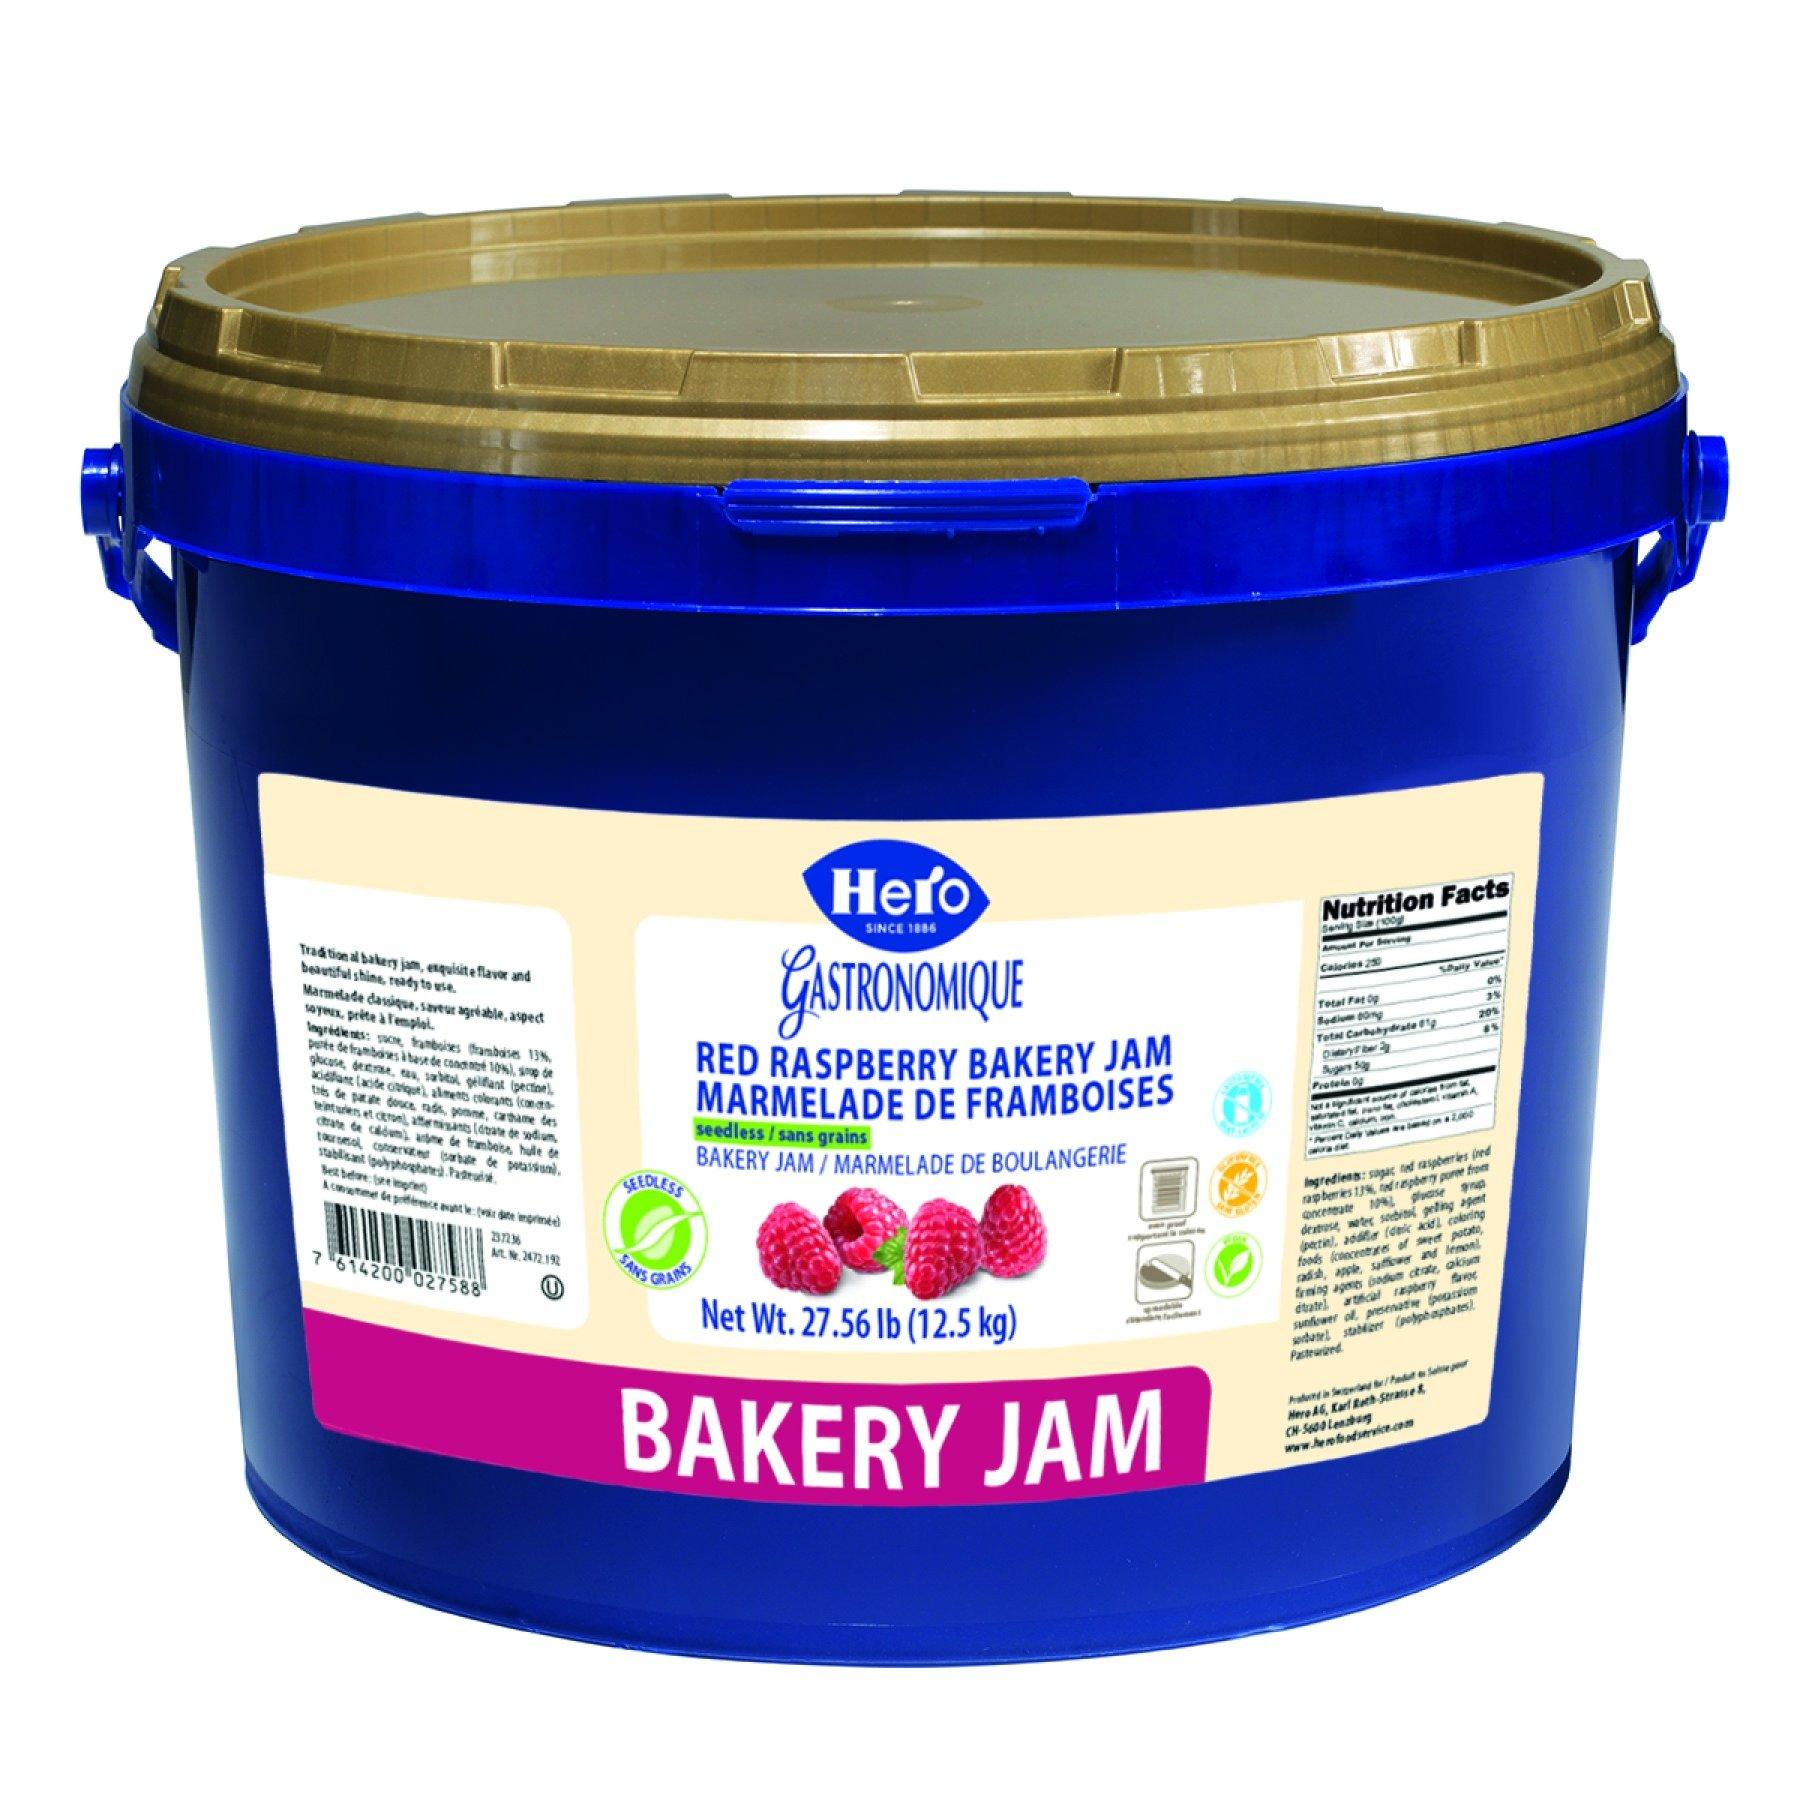 Hero Raspberry Bakery Jam, 27.56 Pound by Hero